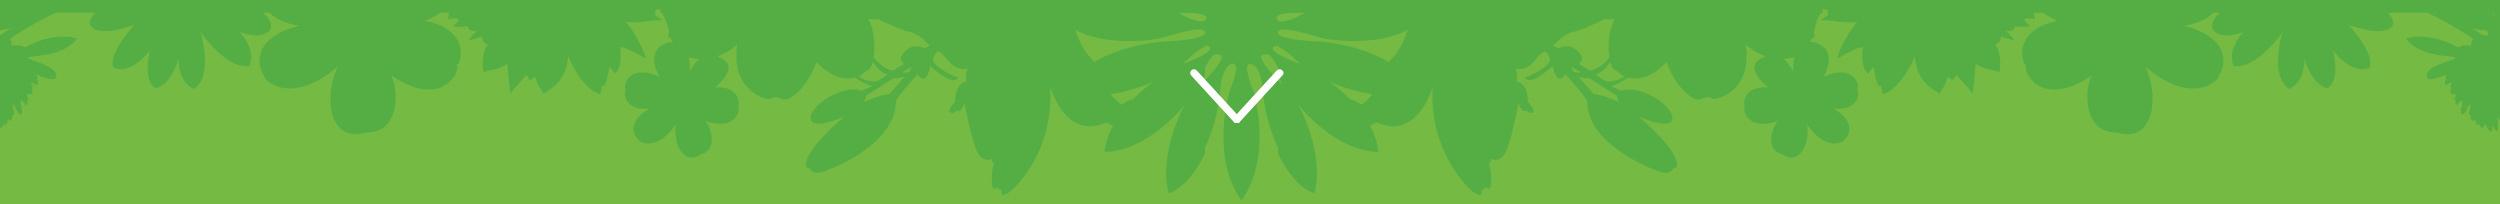 Blekingeplantan website design - Feb 2015